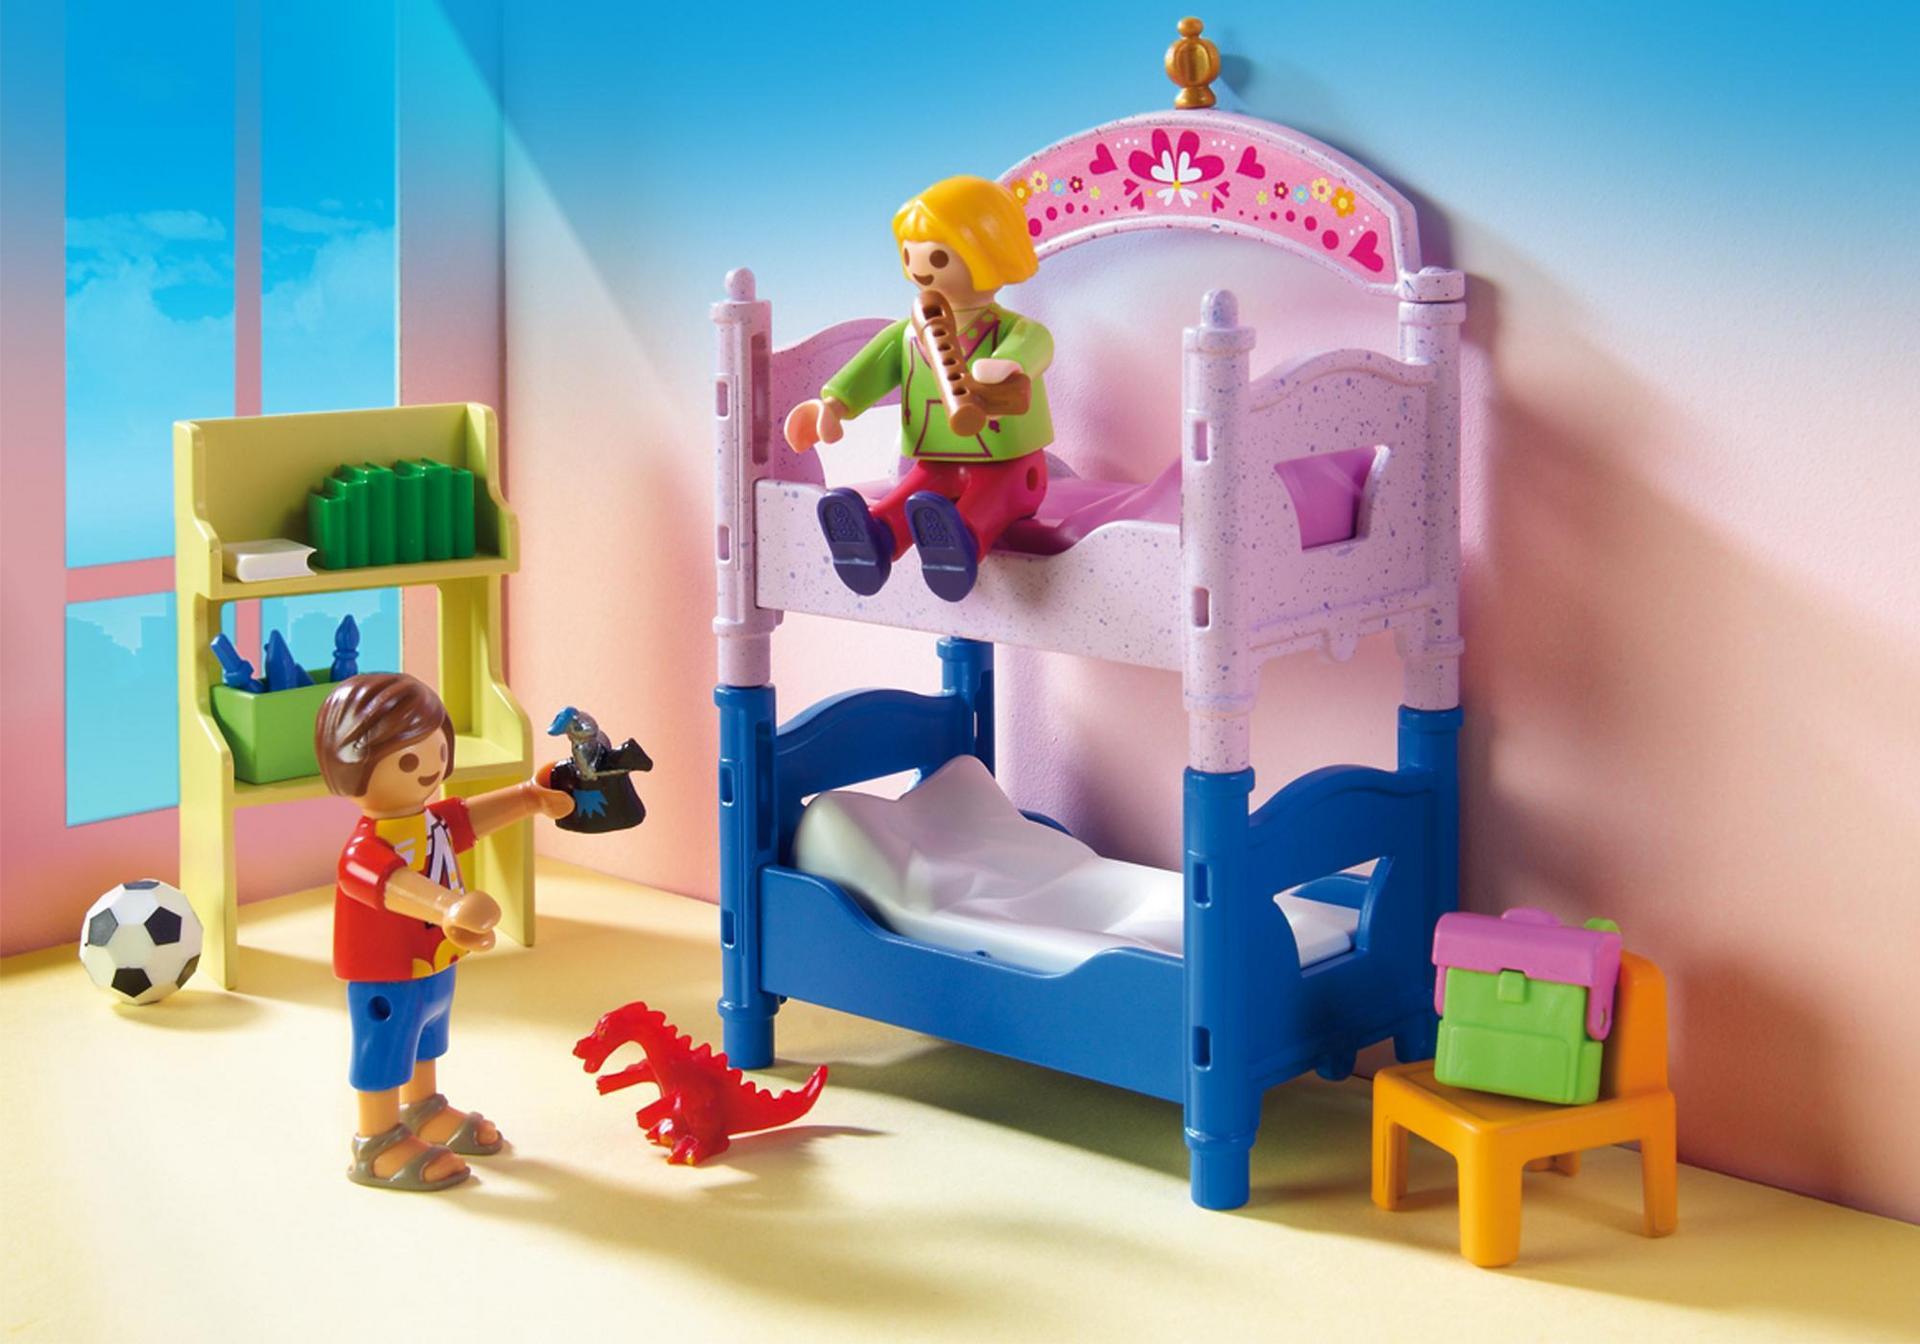 Chambre d 39 enfants avec lits superpos s 5306 playmobil - Playmobil chambre enfant ...